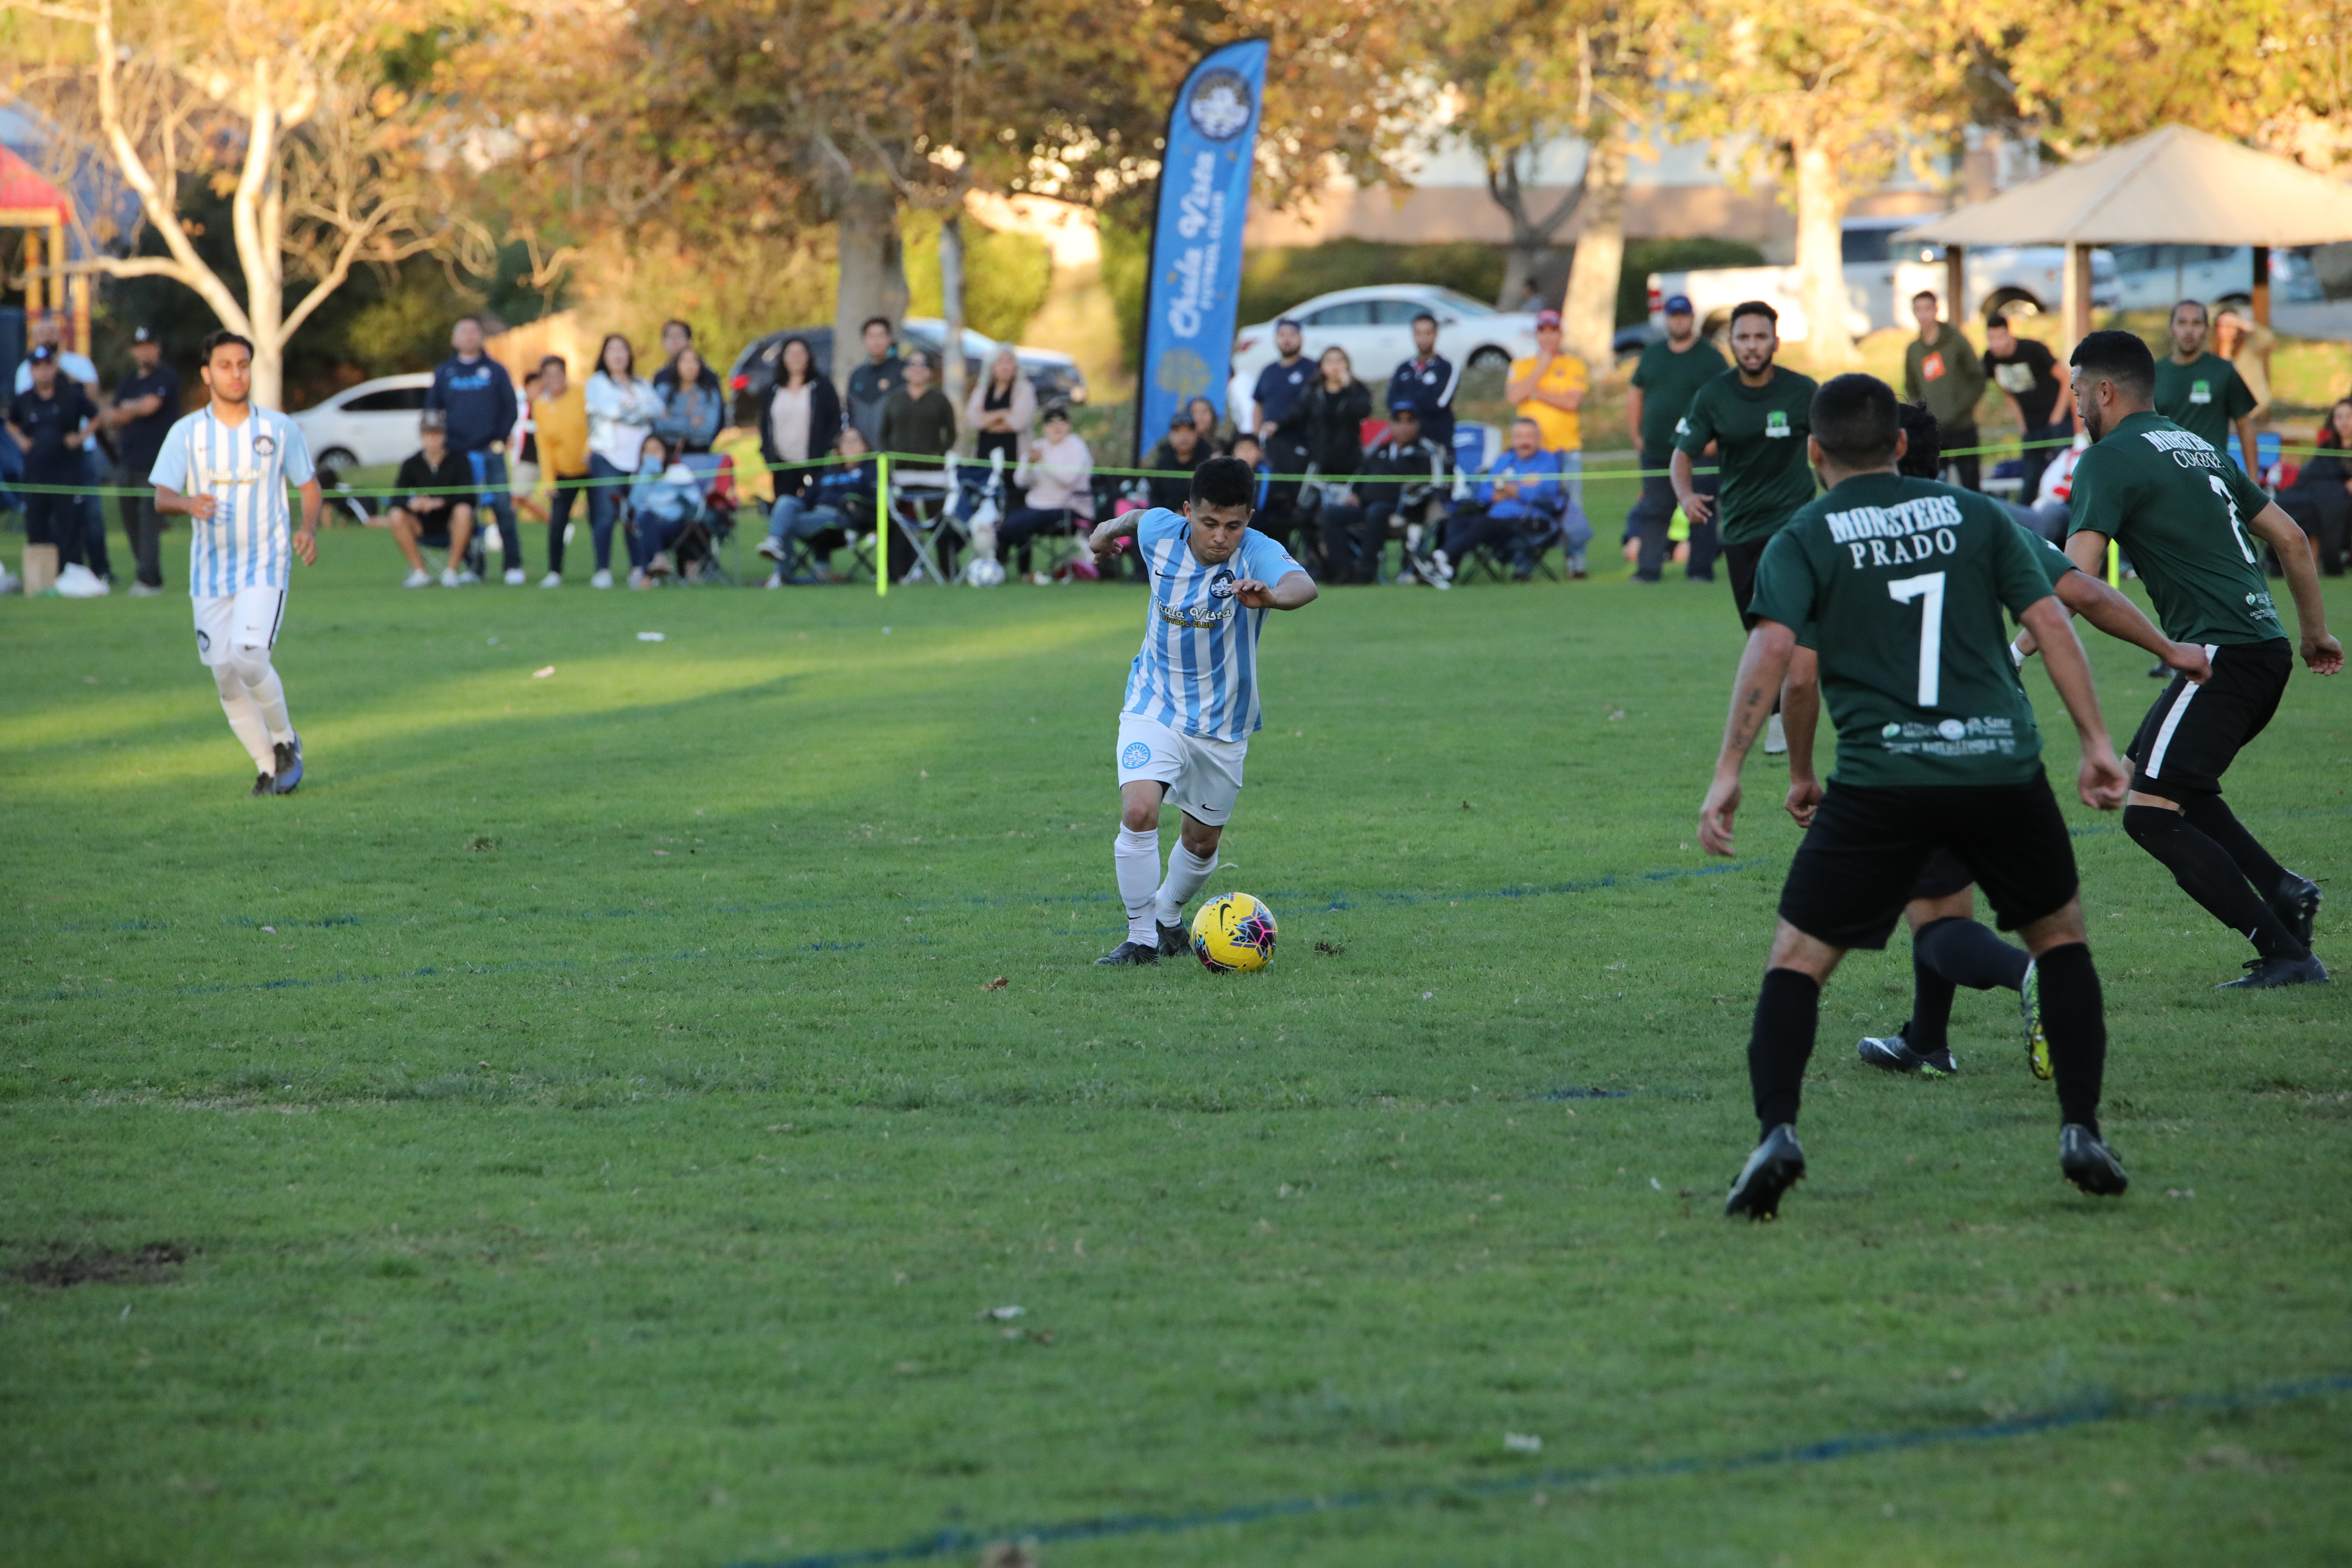 CVFC defeats LA Monsters in a penalty shootout 2-2 (5:4)